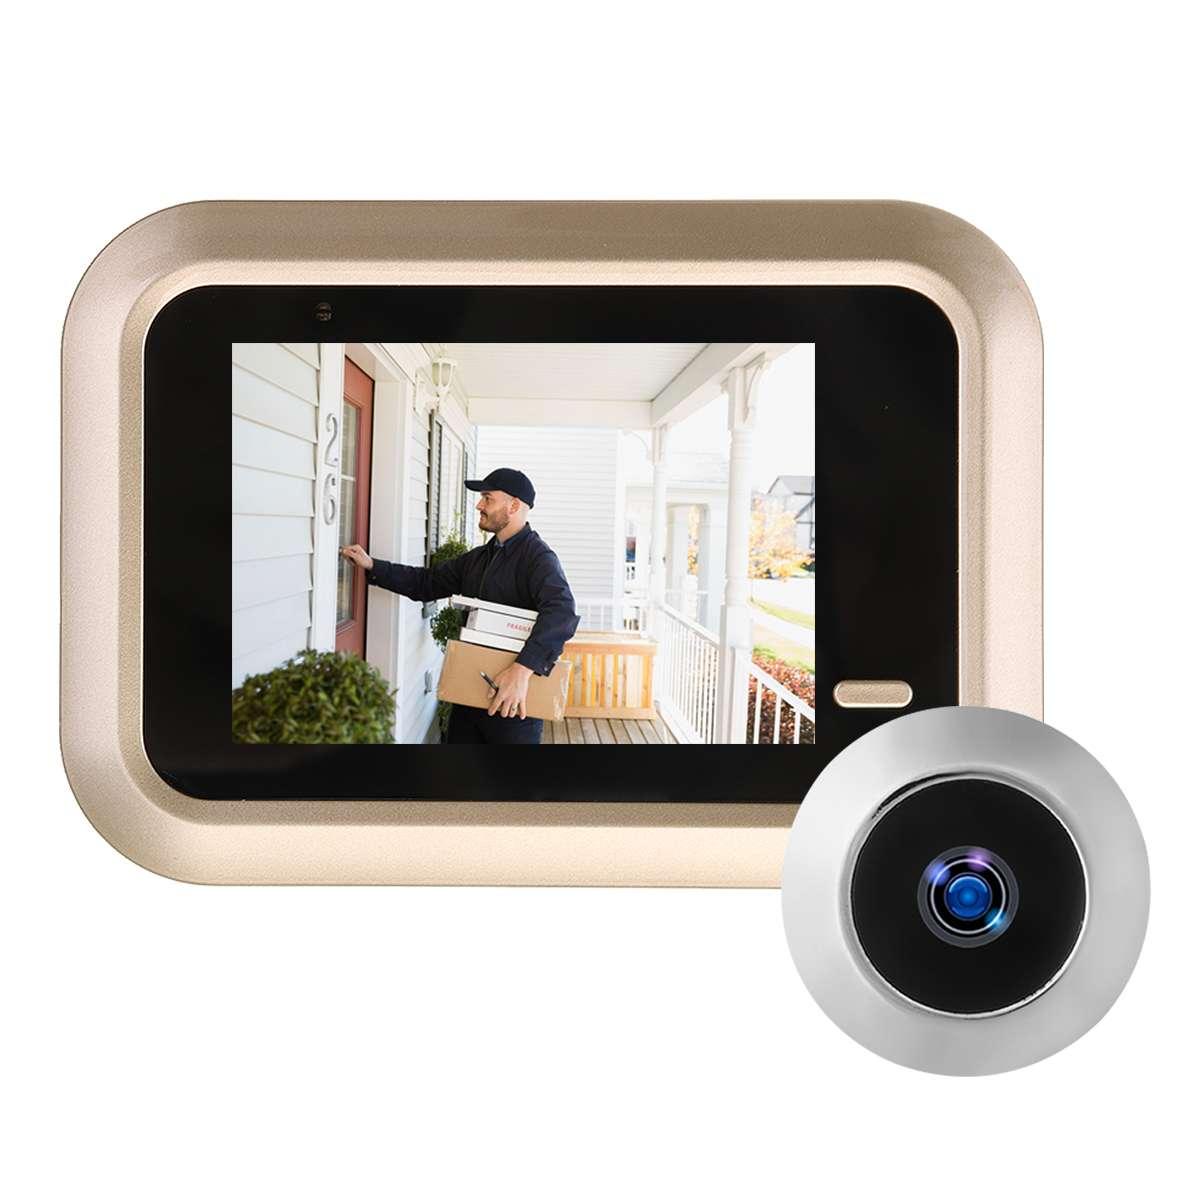 2.4 Inch Peephole Camera LCD TFT Digital Doorbells 160 Degrees View Angle Rechargeable Wireless Home Security Smart Doorbells